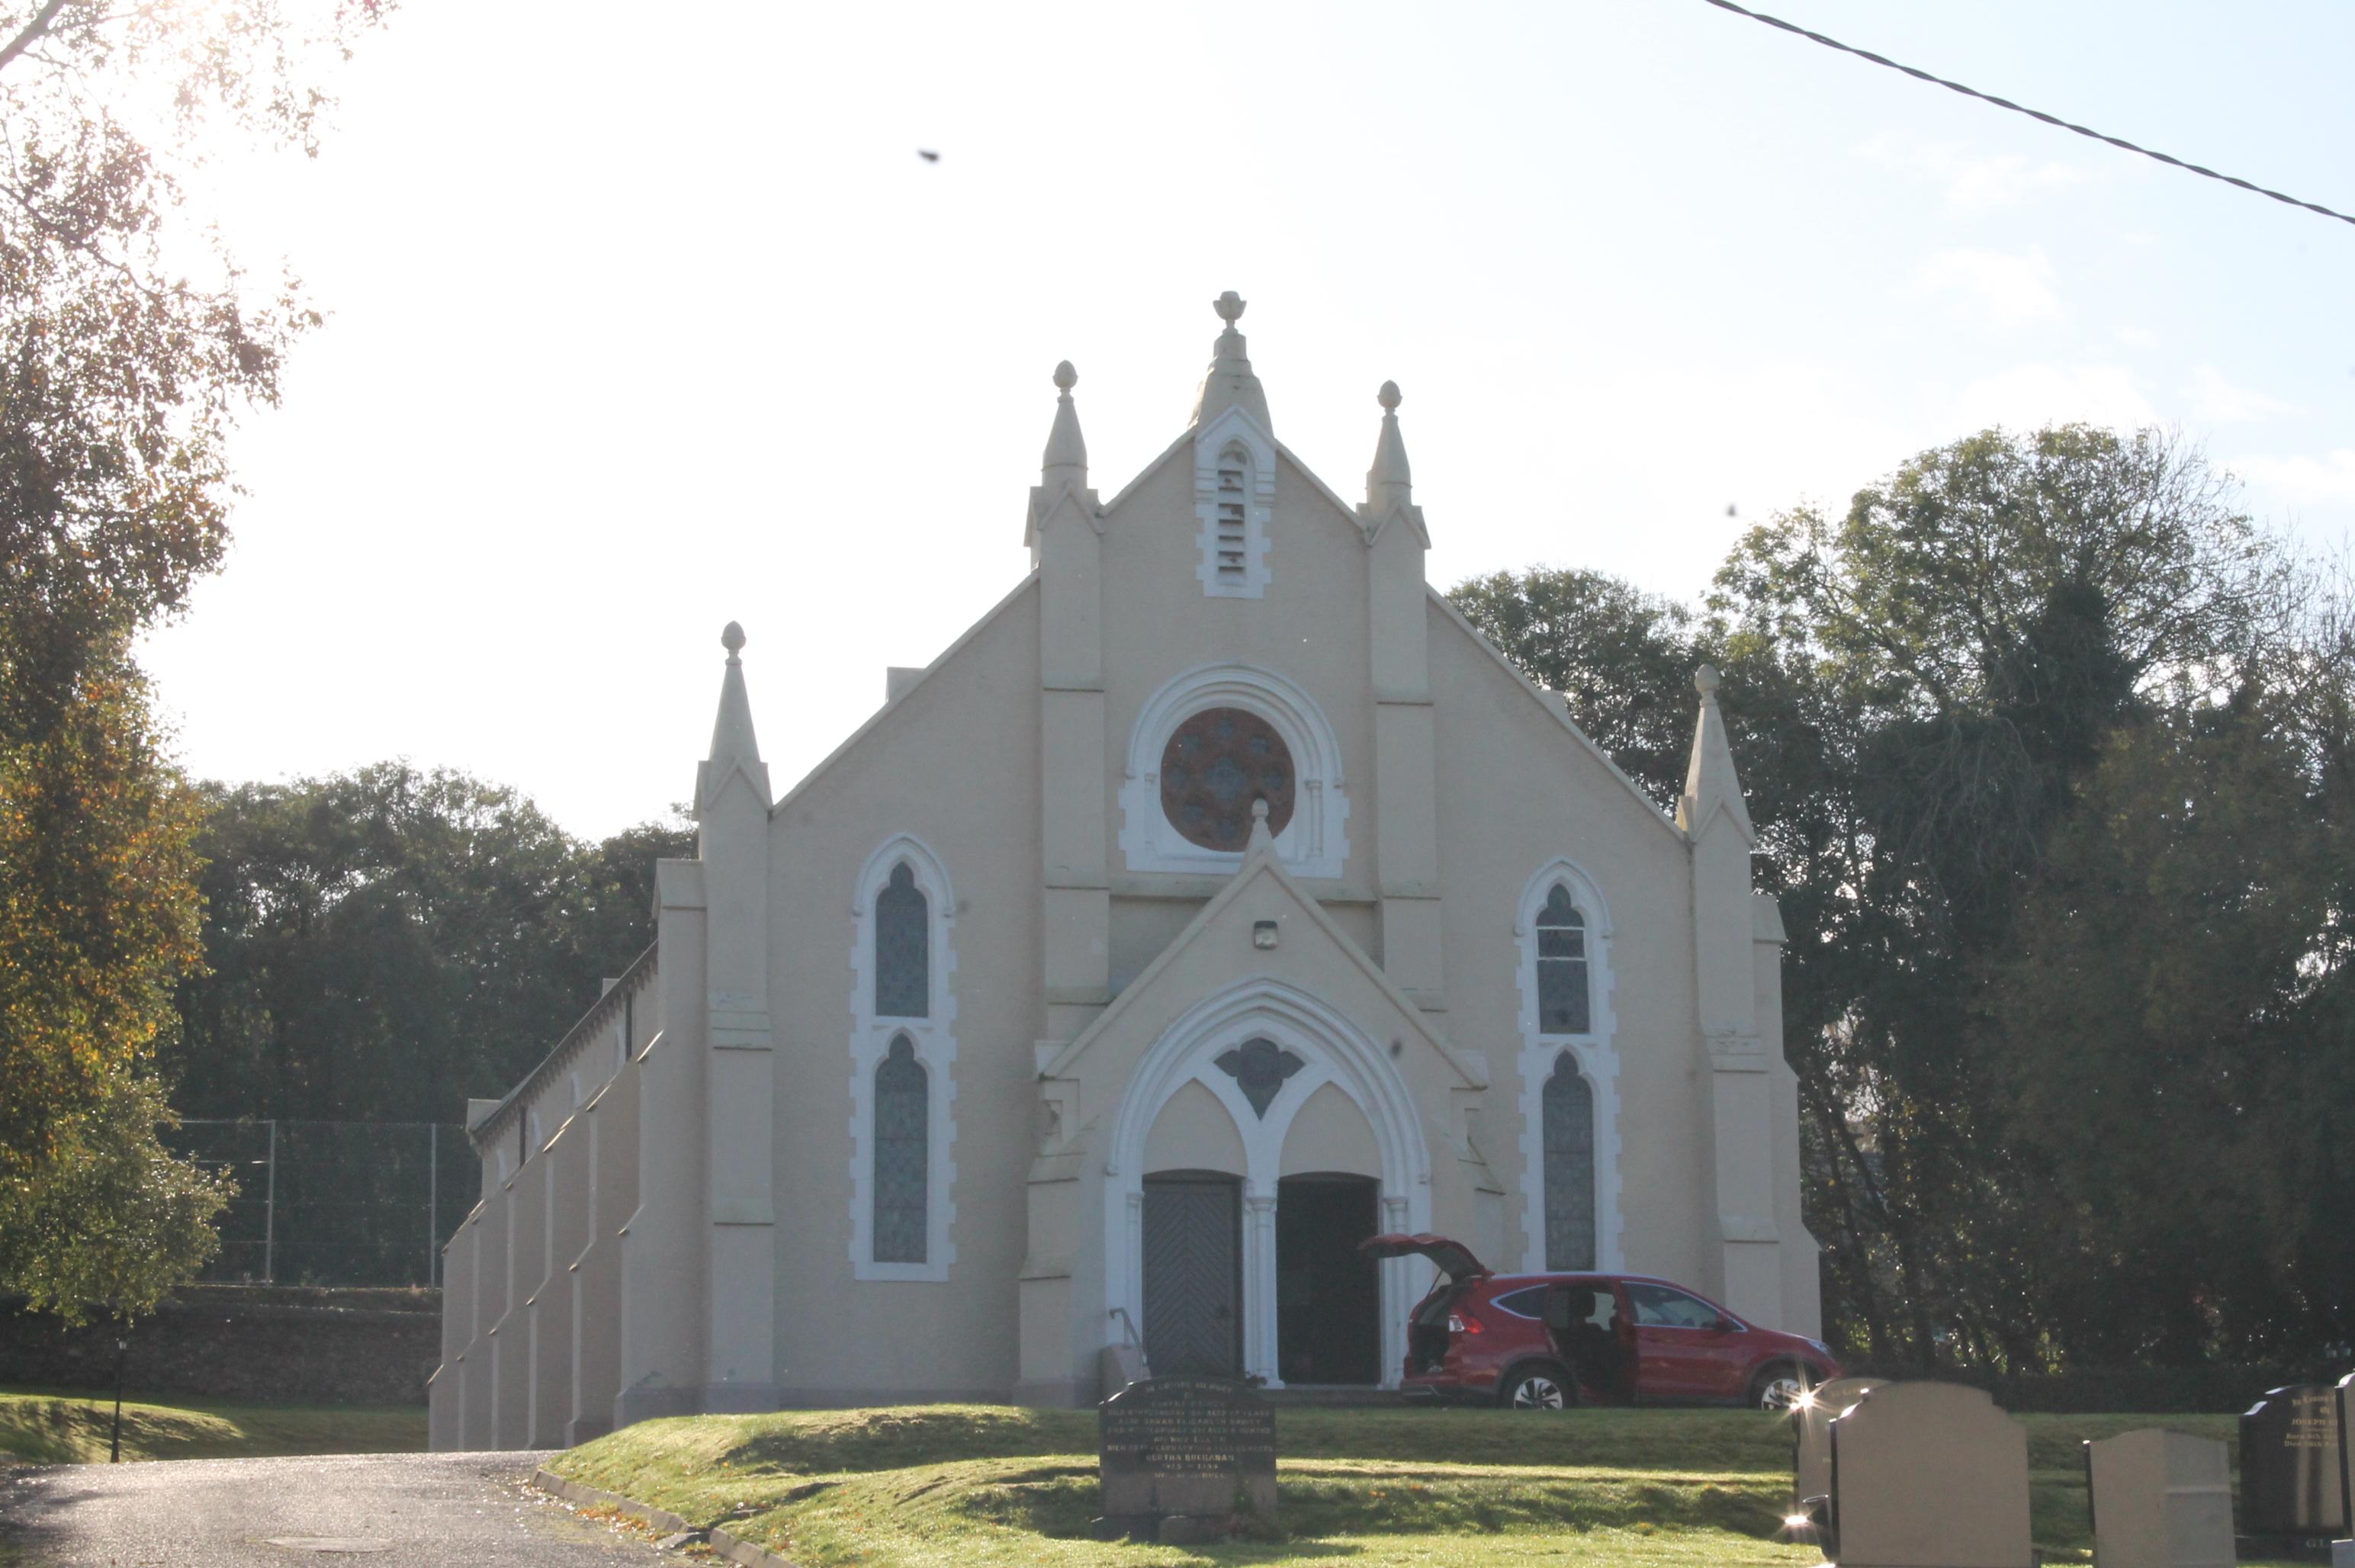 Burt Presbyterian Church